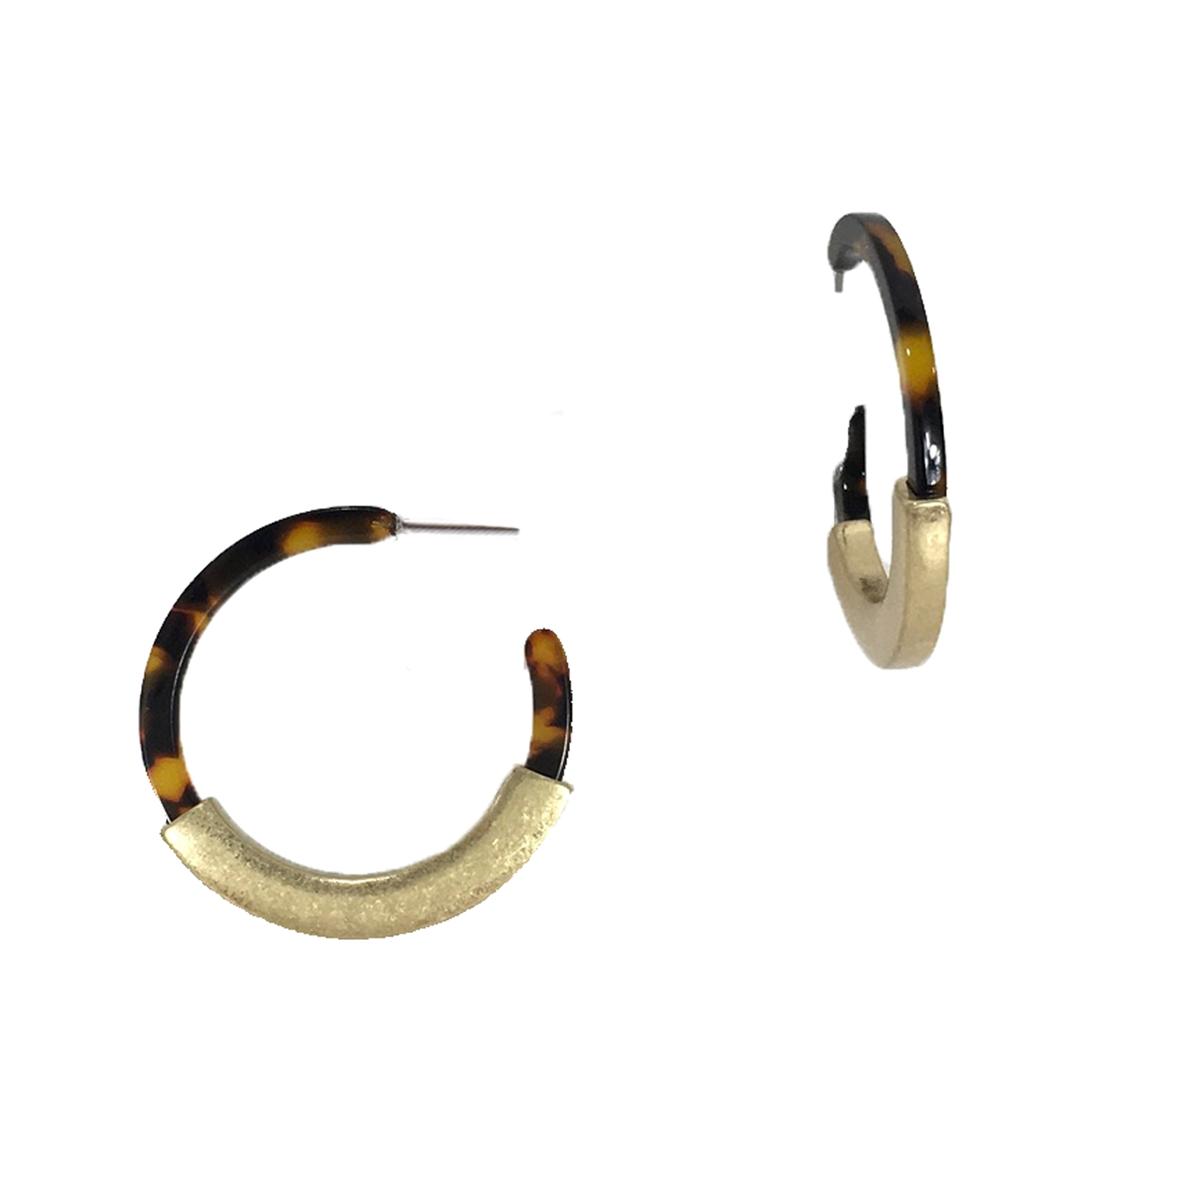 4cc4d2ab3545 Jewelry Collection Daria Metal Bar Resin Hoop Earrings